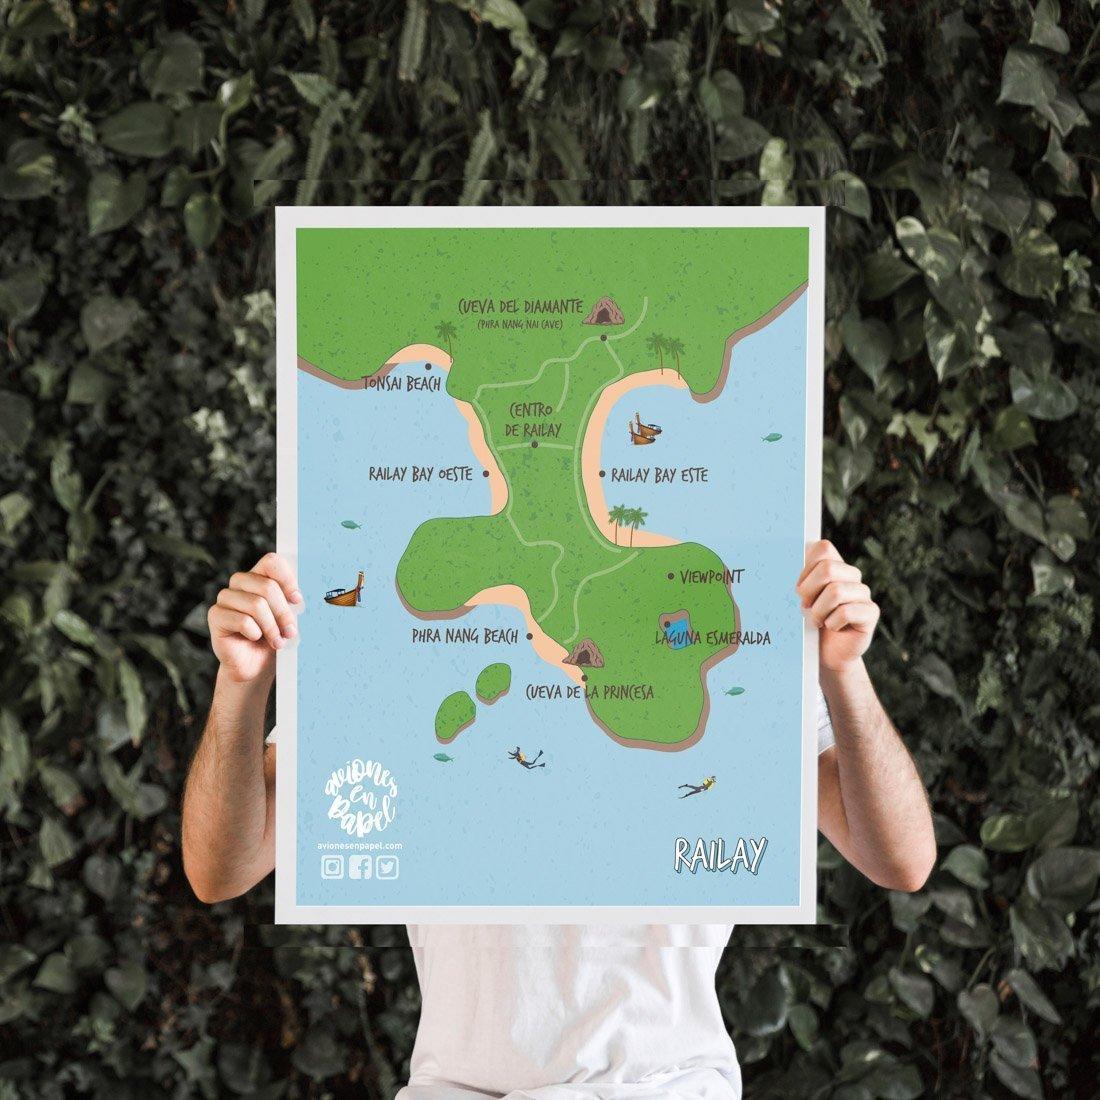 Mapa para descargar de Railay